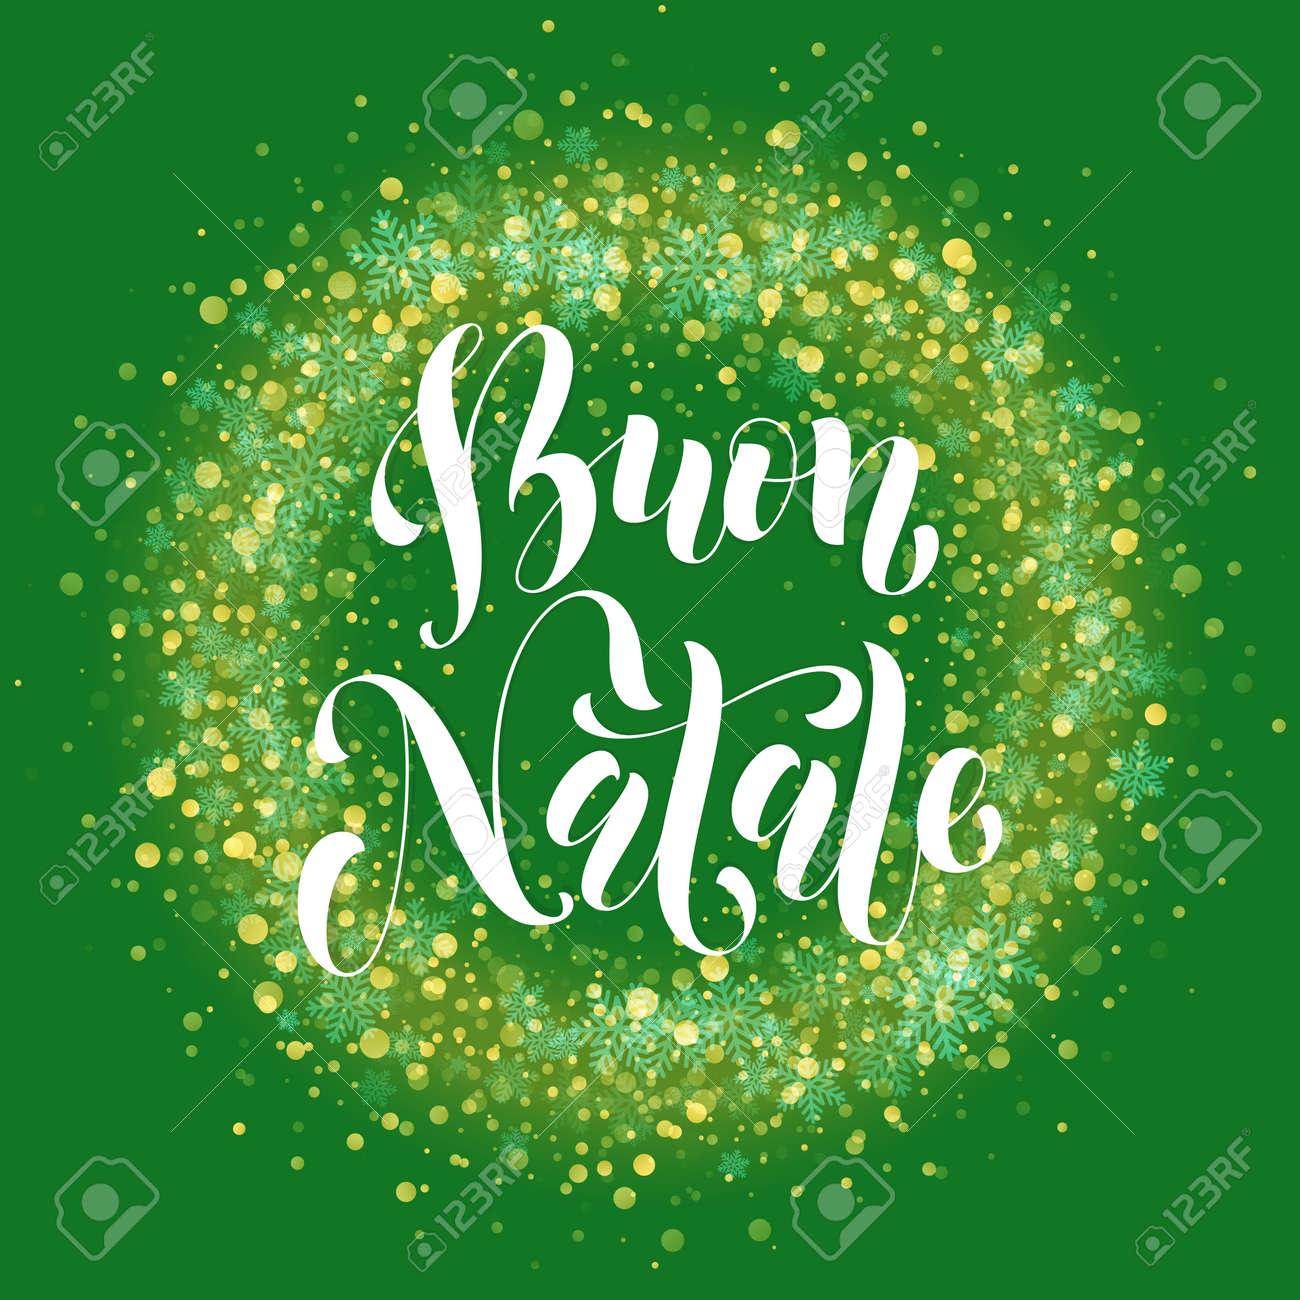 Buon Natale Ornament.Italian Merry Christmas Text Buon Natale Wreath Ornament Decoration